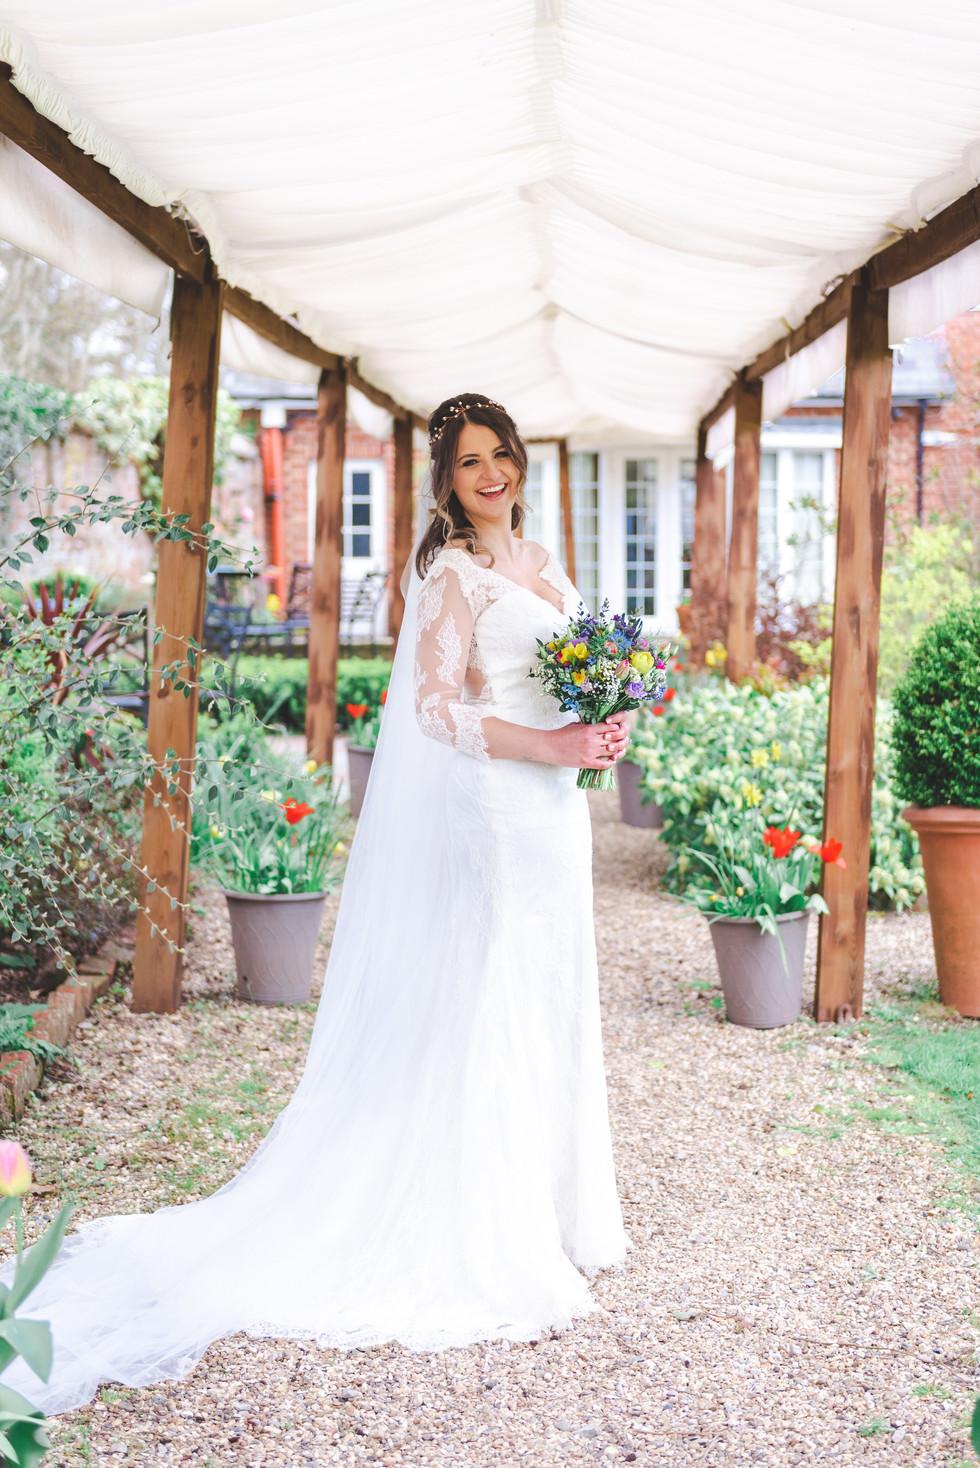 Bride under marquee archway